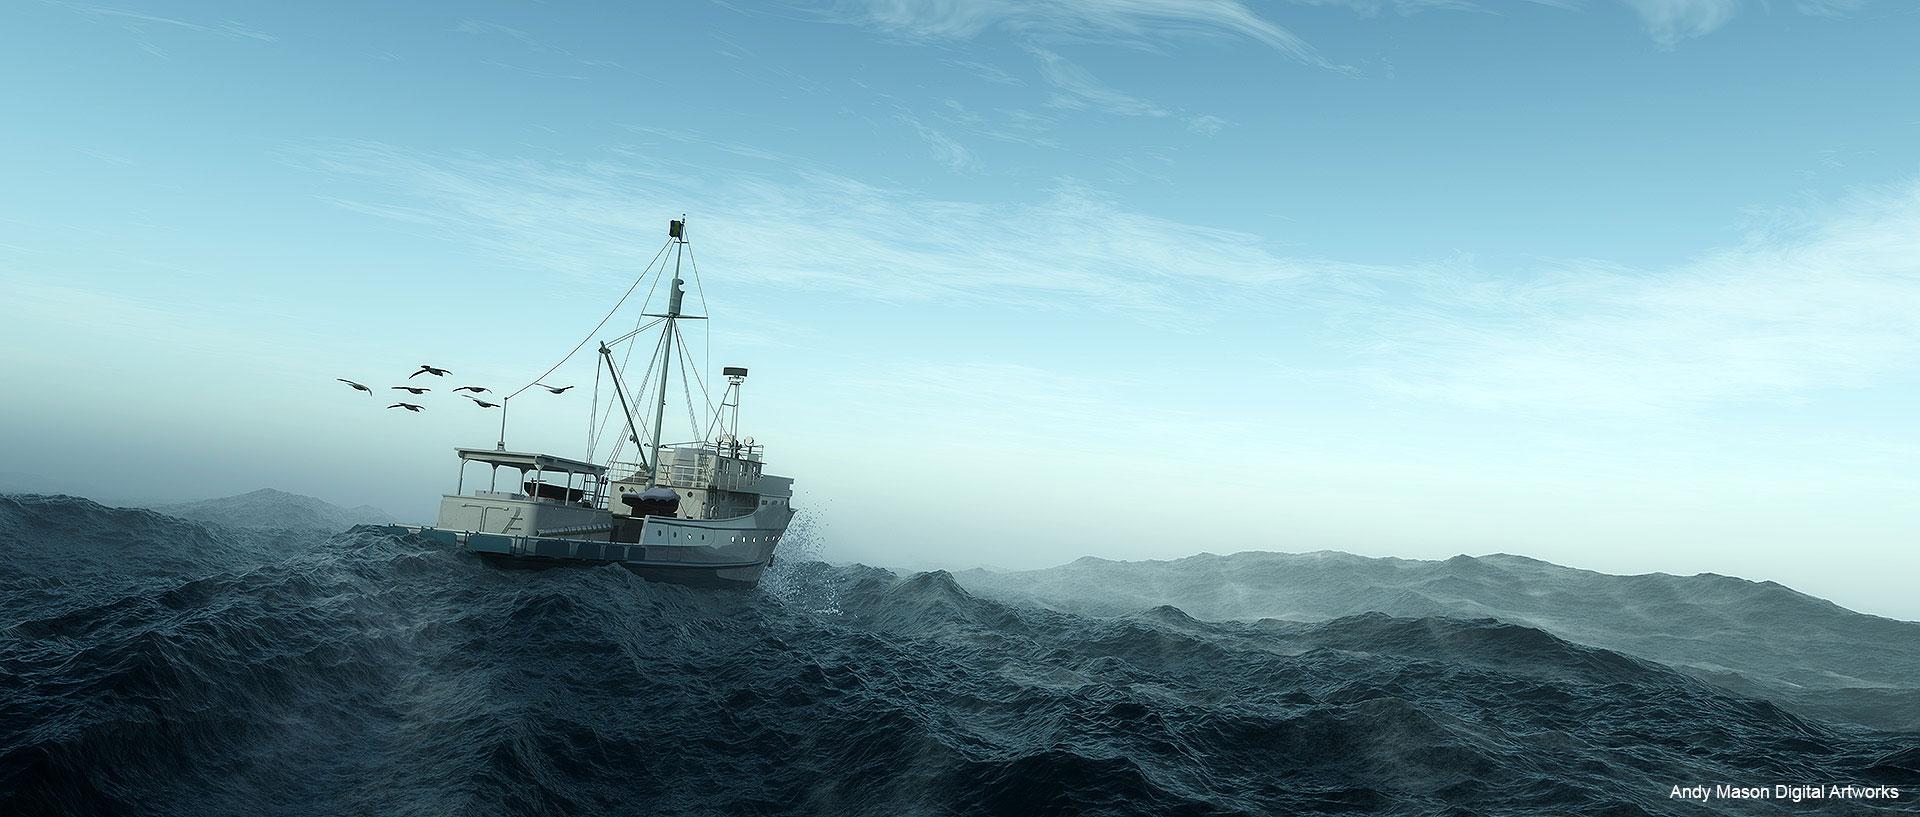 Peril on the Sea: NauticalNightmares